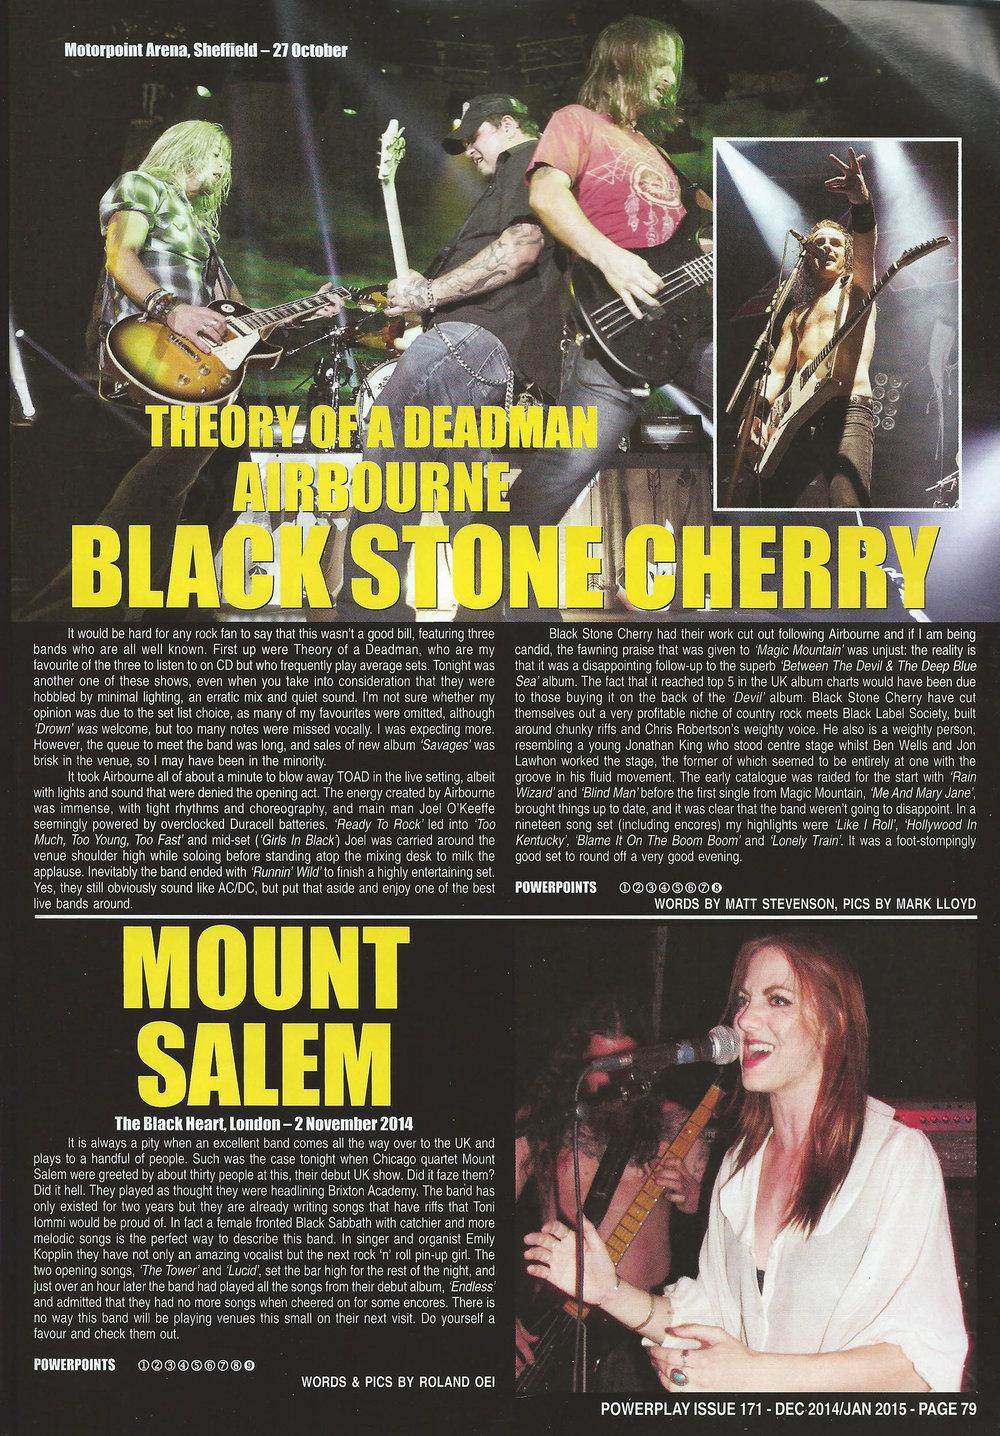 PowerPlay Magazine - Black Stone Cherry Photos